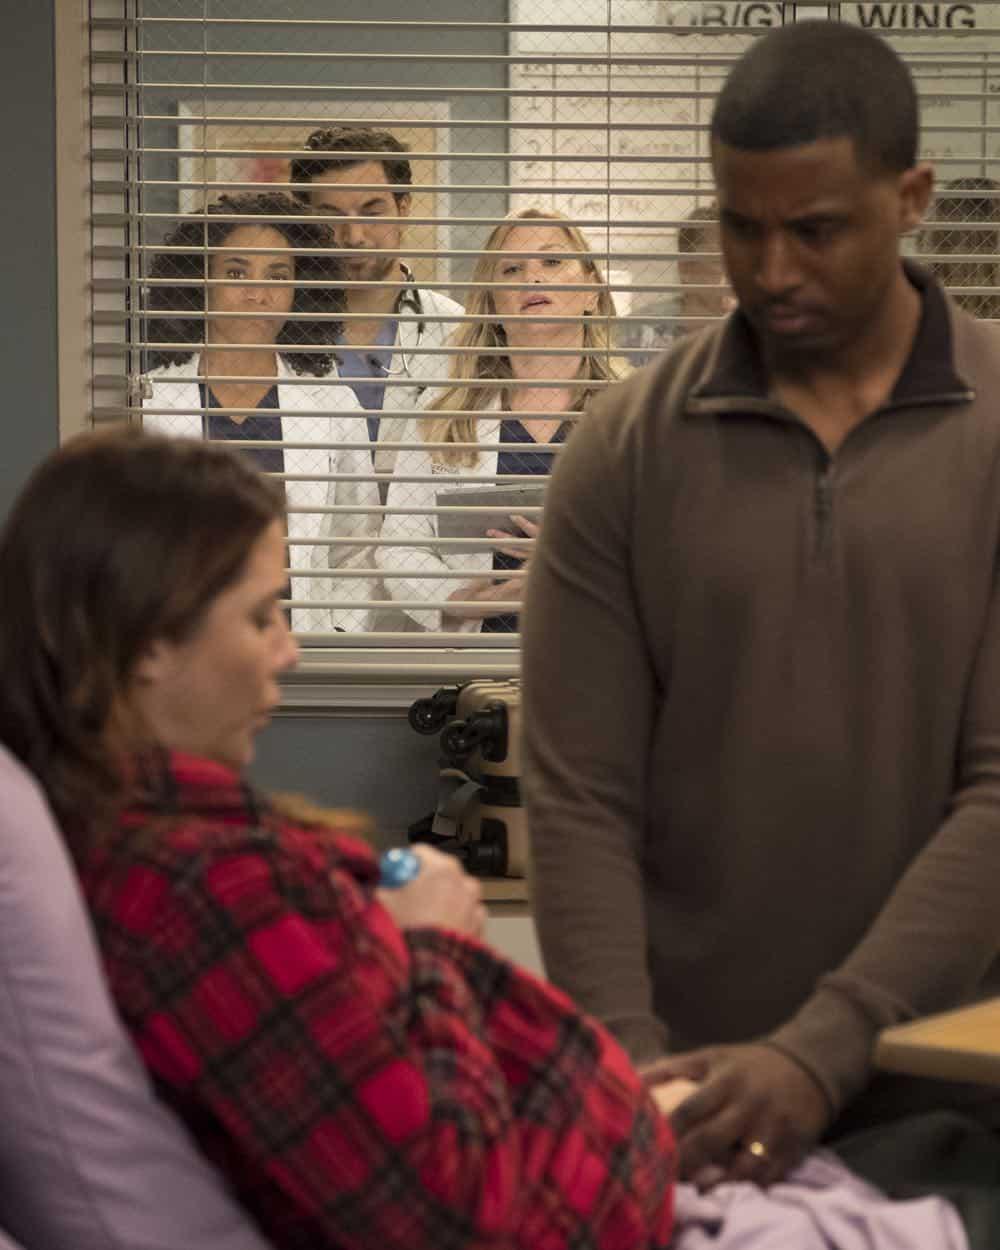 Greys Anatomy Season 14 Episode 22 Photos Fight For Your Mind Seat42f